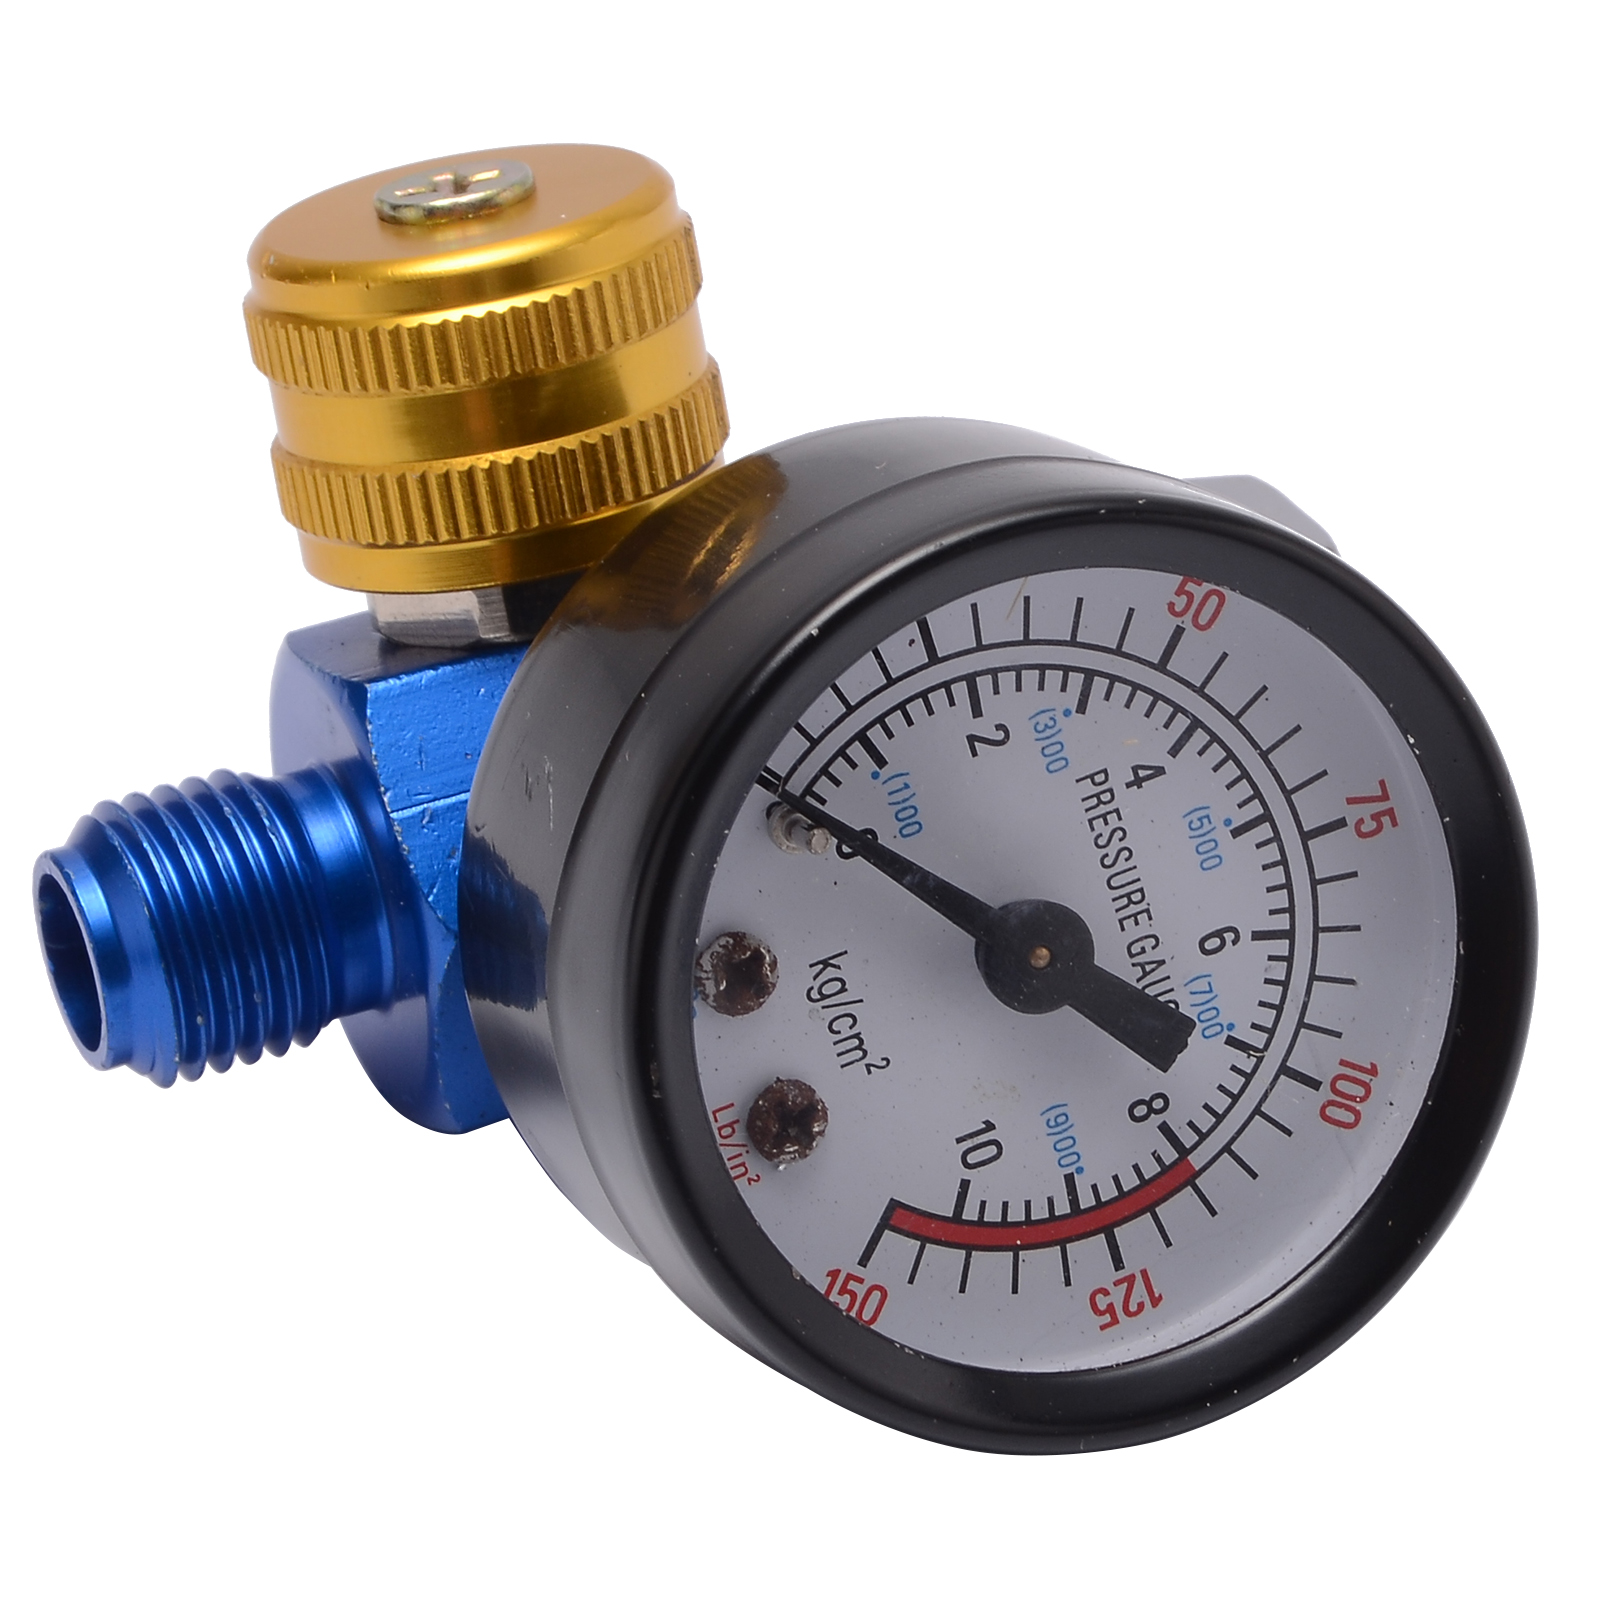 1/4'' Spray Paint Gun Air Pressure Regulator Pressure Gauge Pneumatic Tool Accessory For Spray Tool